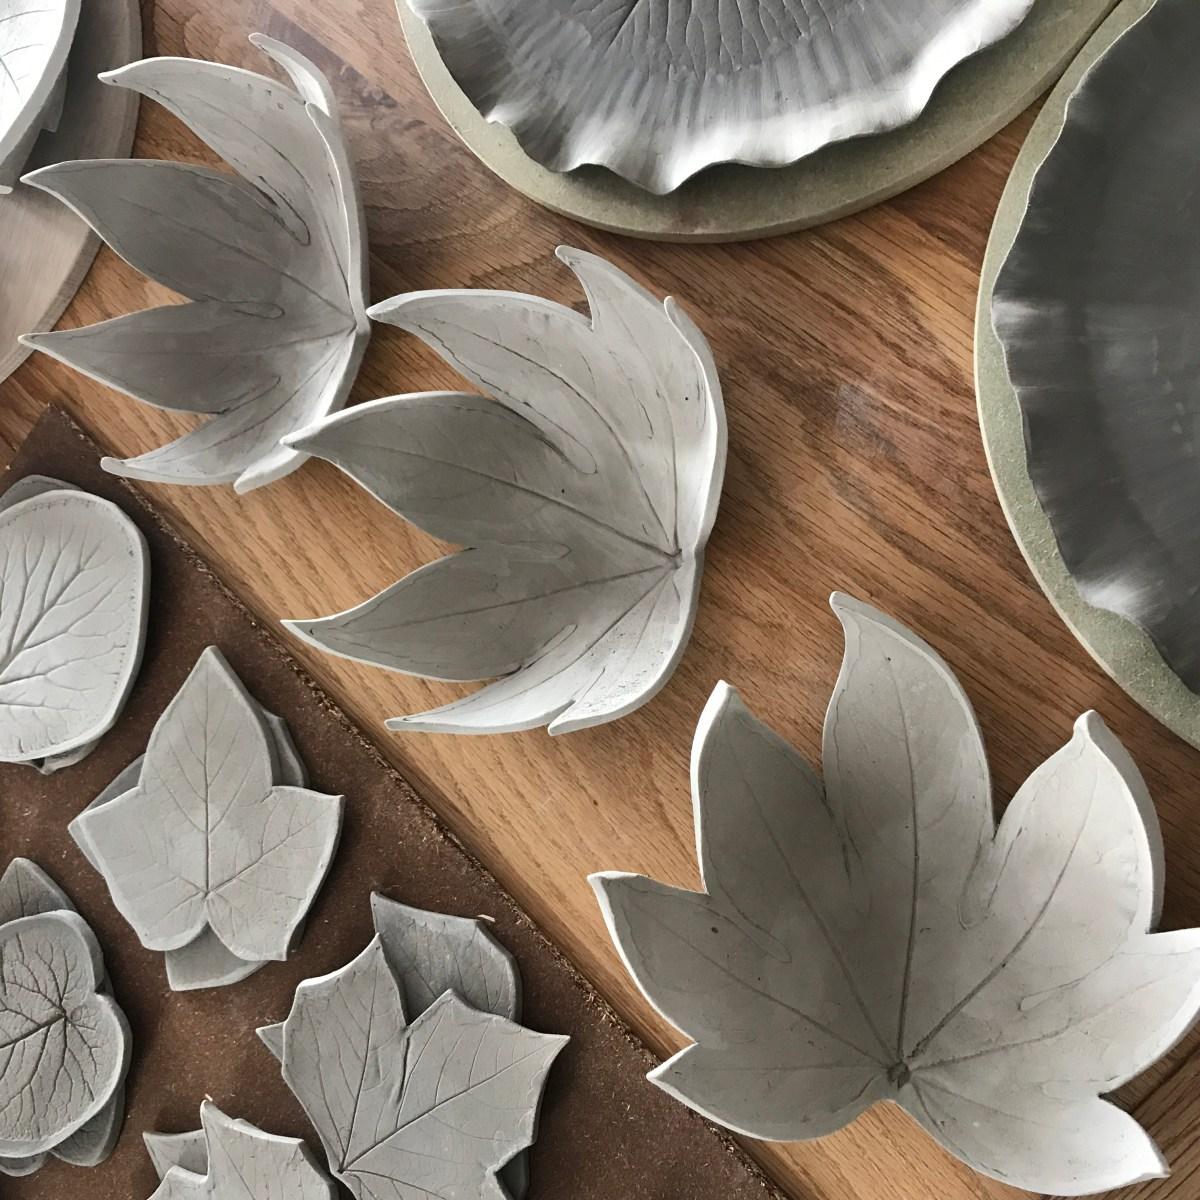 Fatsia Trinket Dishes by Sonya Ceramic Art 'In The Making'